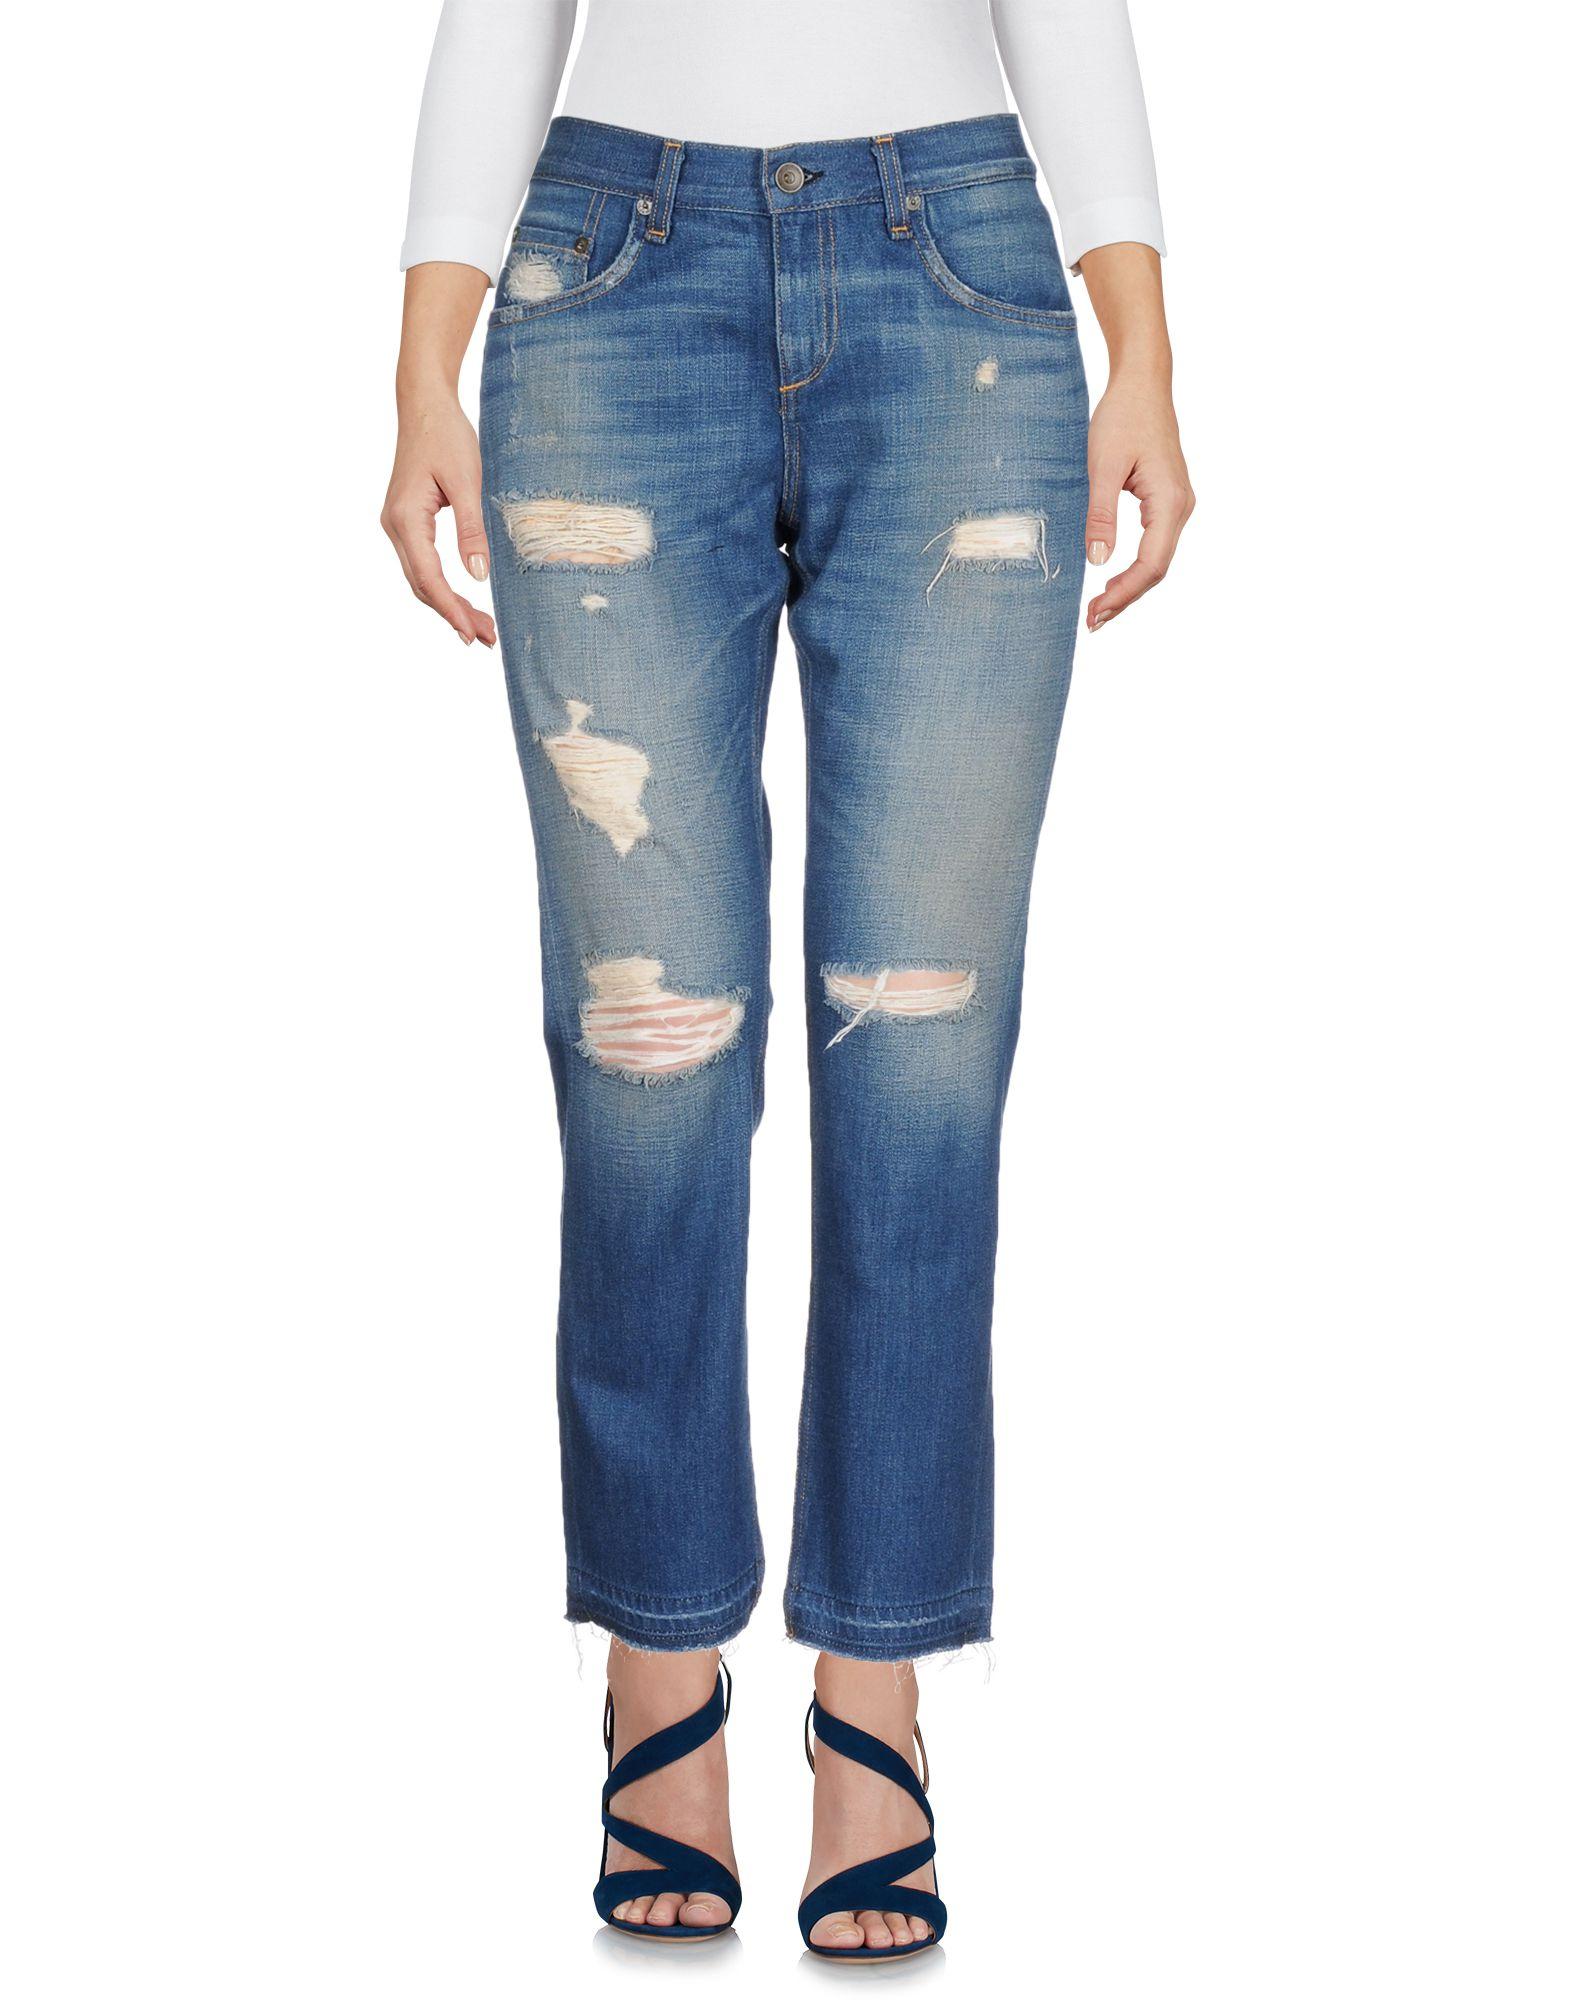 Pantaloni Jeans Rag & Bone Donna - Acquista online su tZKjMYWaW